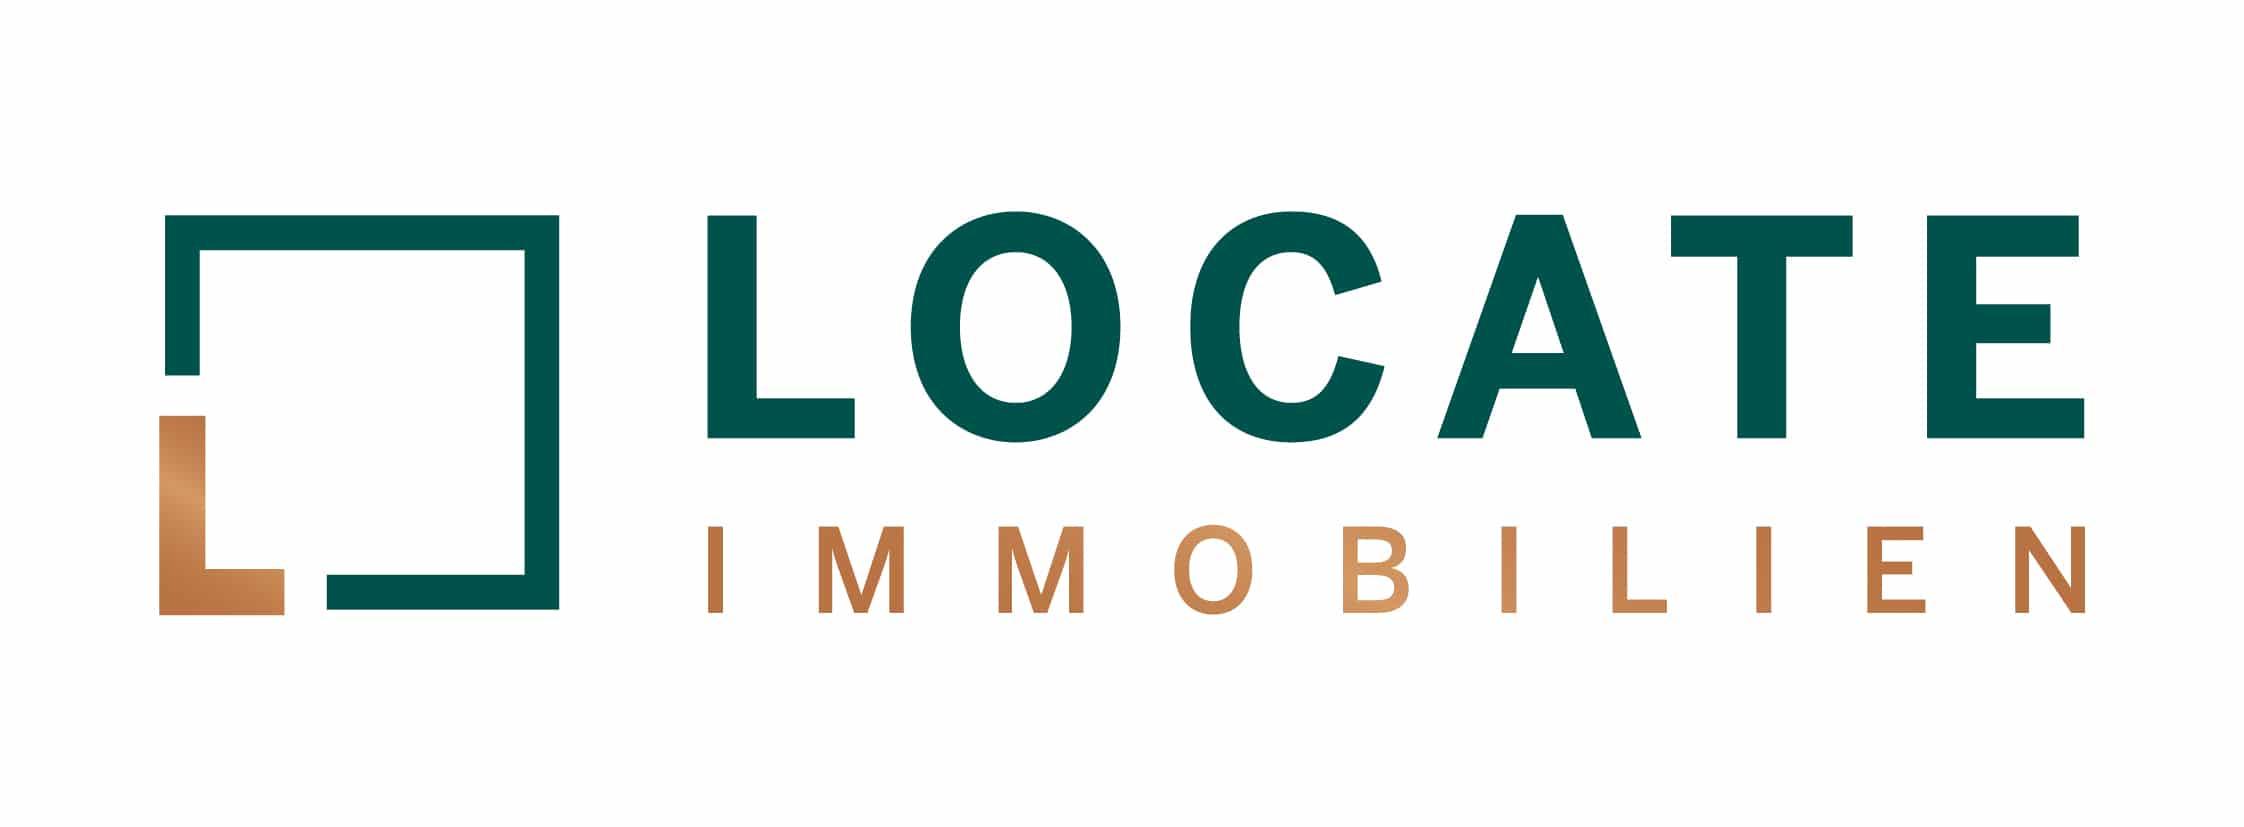 LOCATE Immobilien Logo